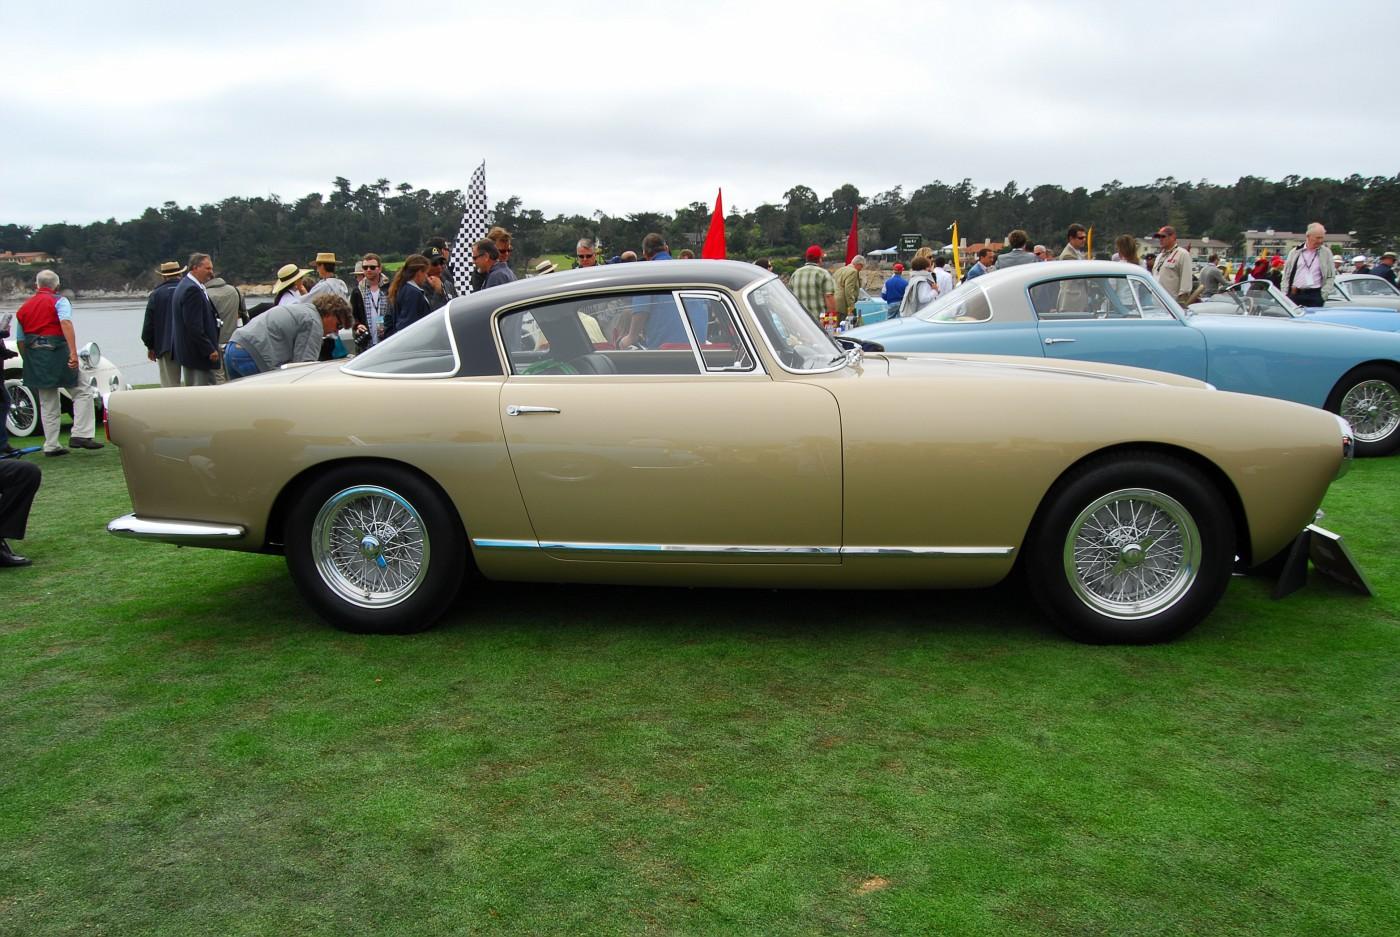 1957 Ferrari 250 GT Boano Coupe side exterior view